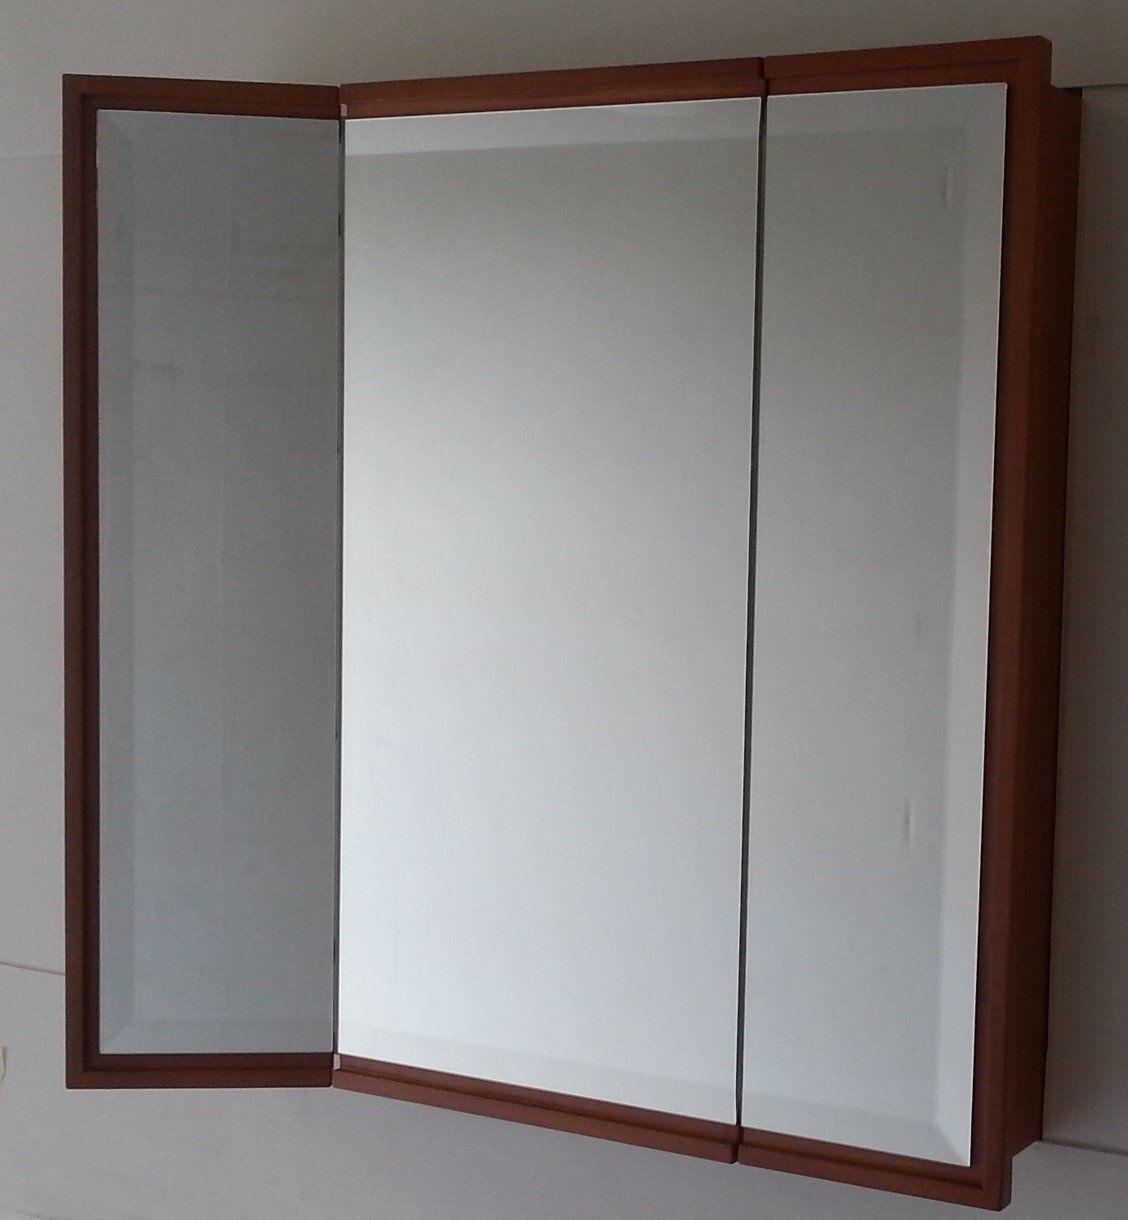 48 Medicine Cabinet Custom Amazon  Wooden Medicine Cabinet  Cinnamon Maple Wood Framed 1 Decorating Design